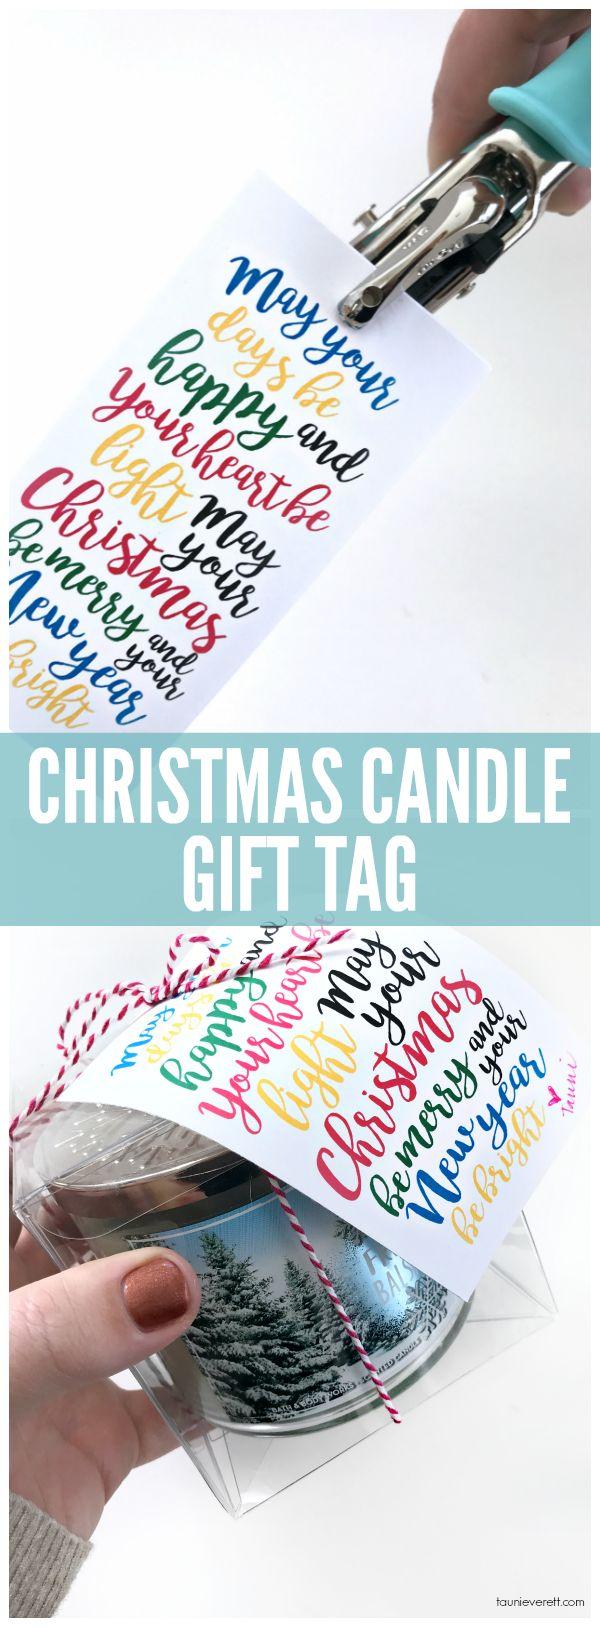 Print + Cut Christmas Candle Gift Tag